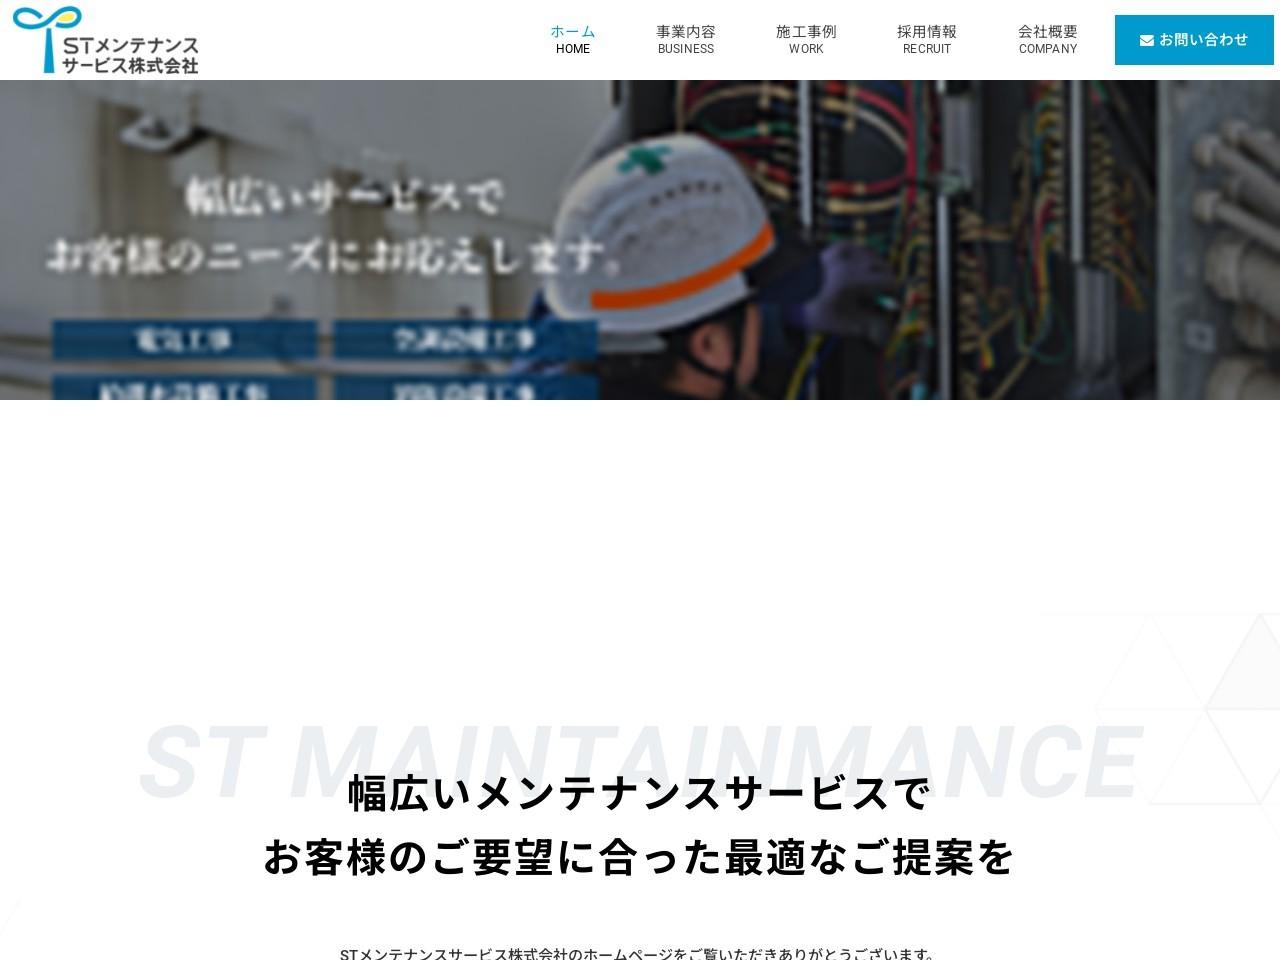 STメンテナンスサービス株式会社